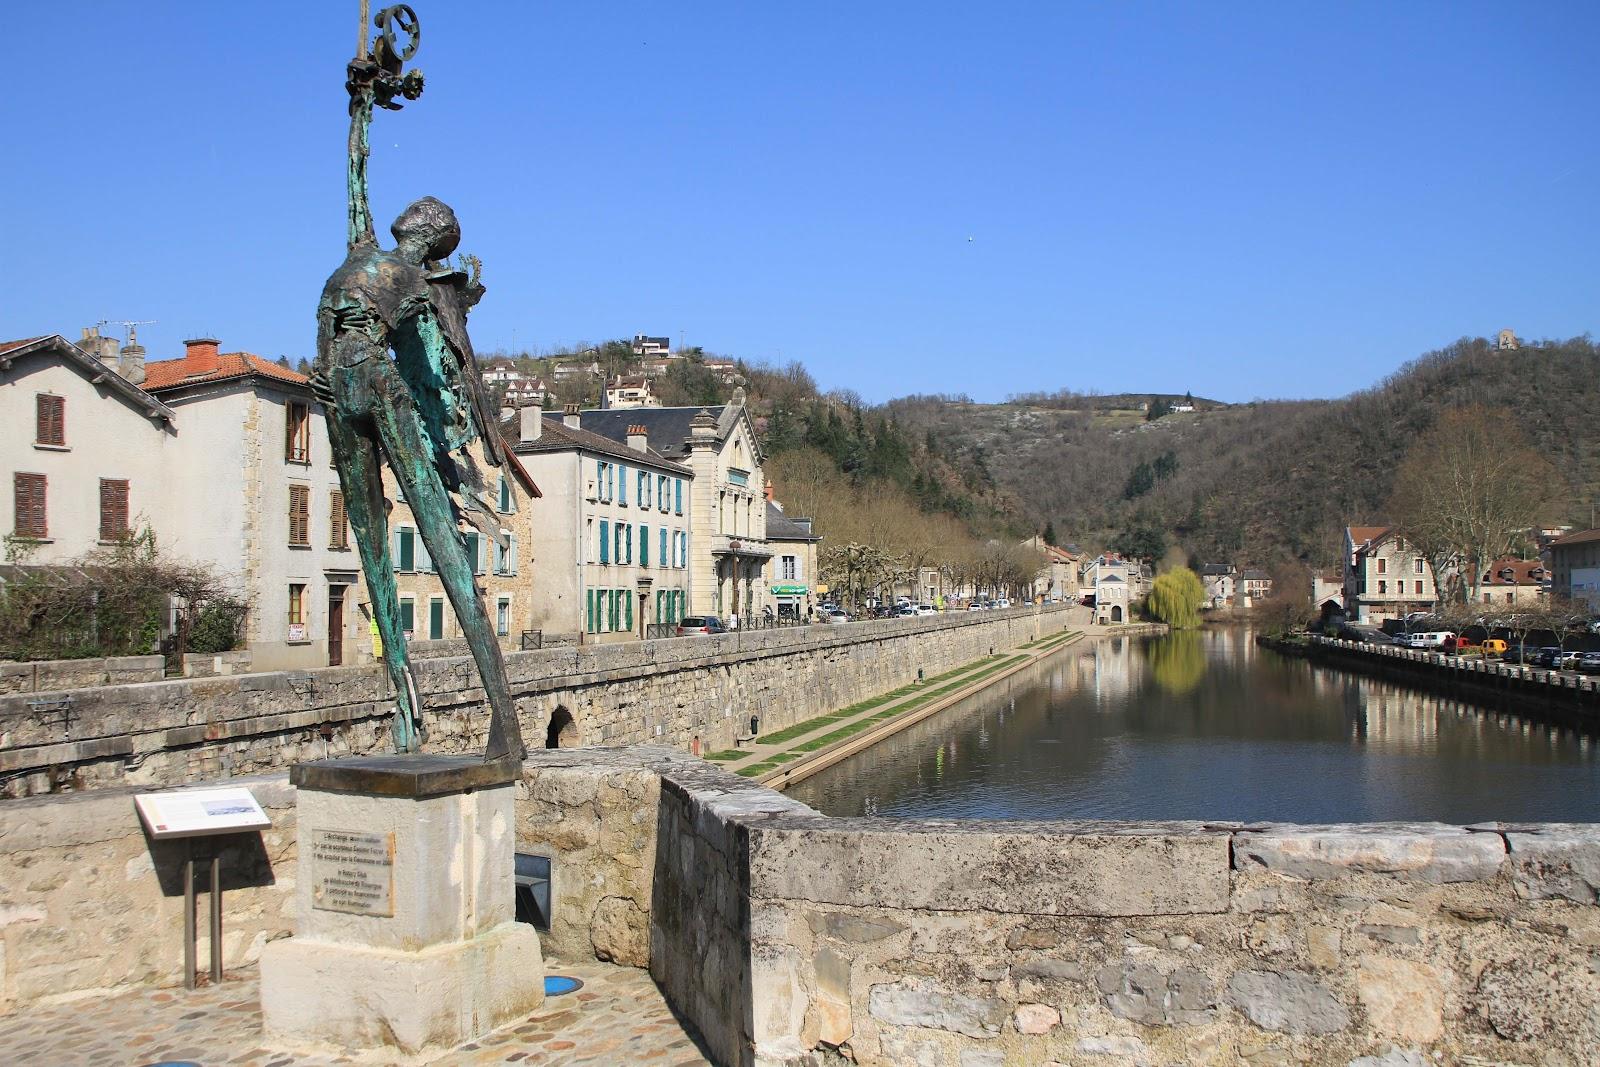 Gite en aveyron villefranche de rouergue for Aquilus piscine villefranche de rouergue